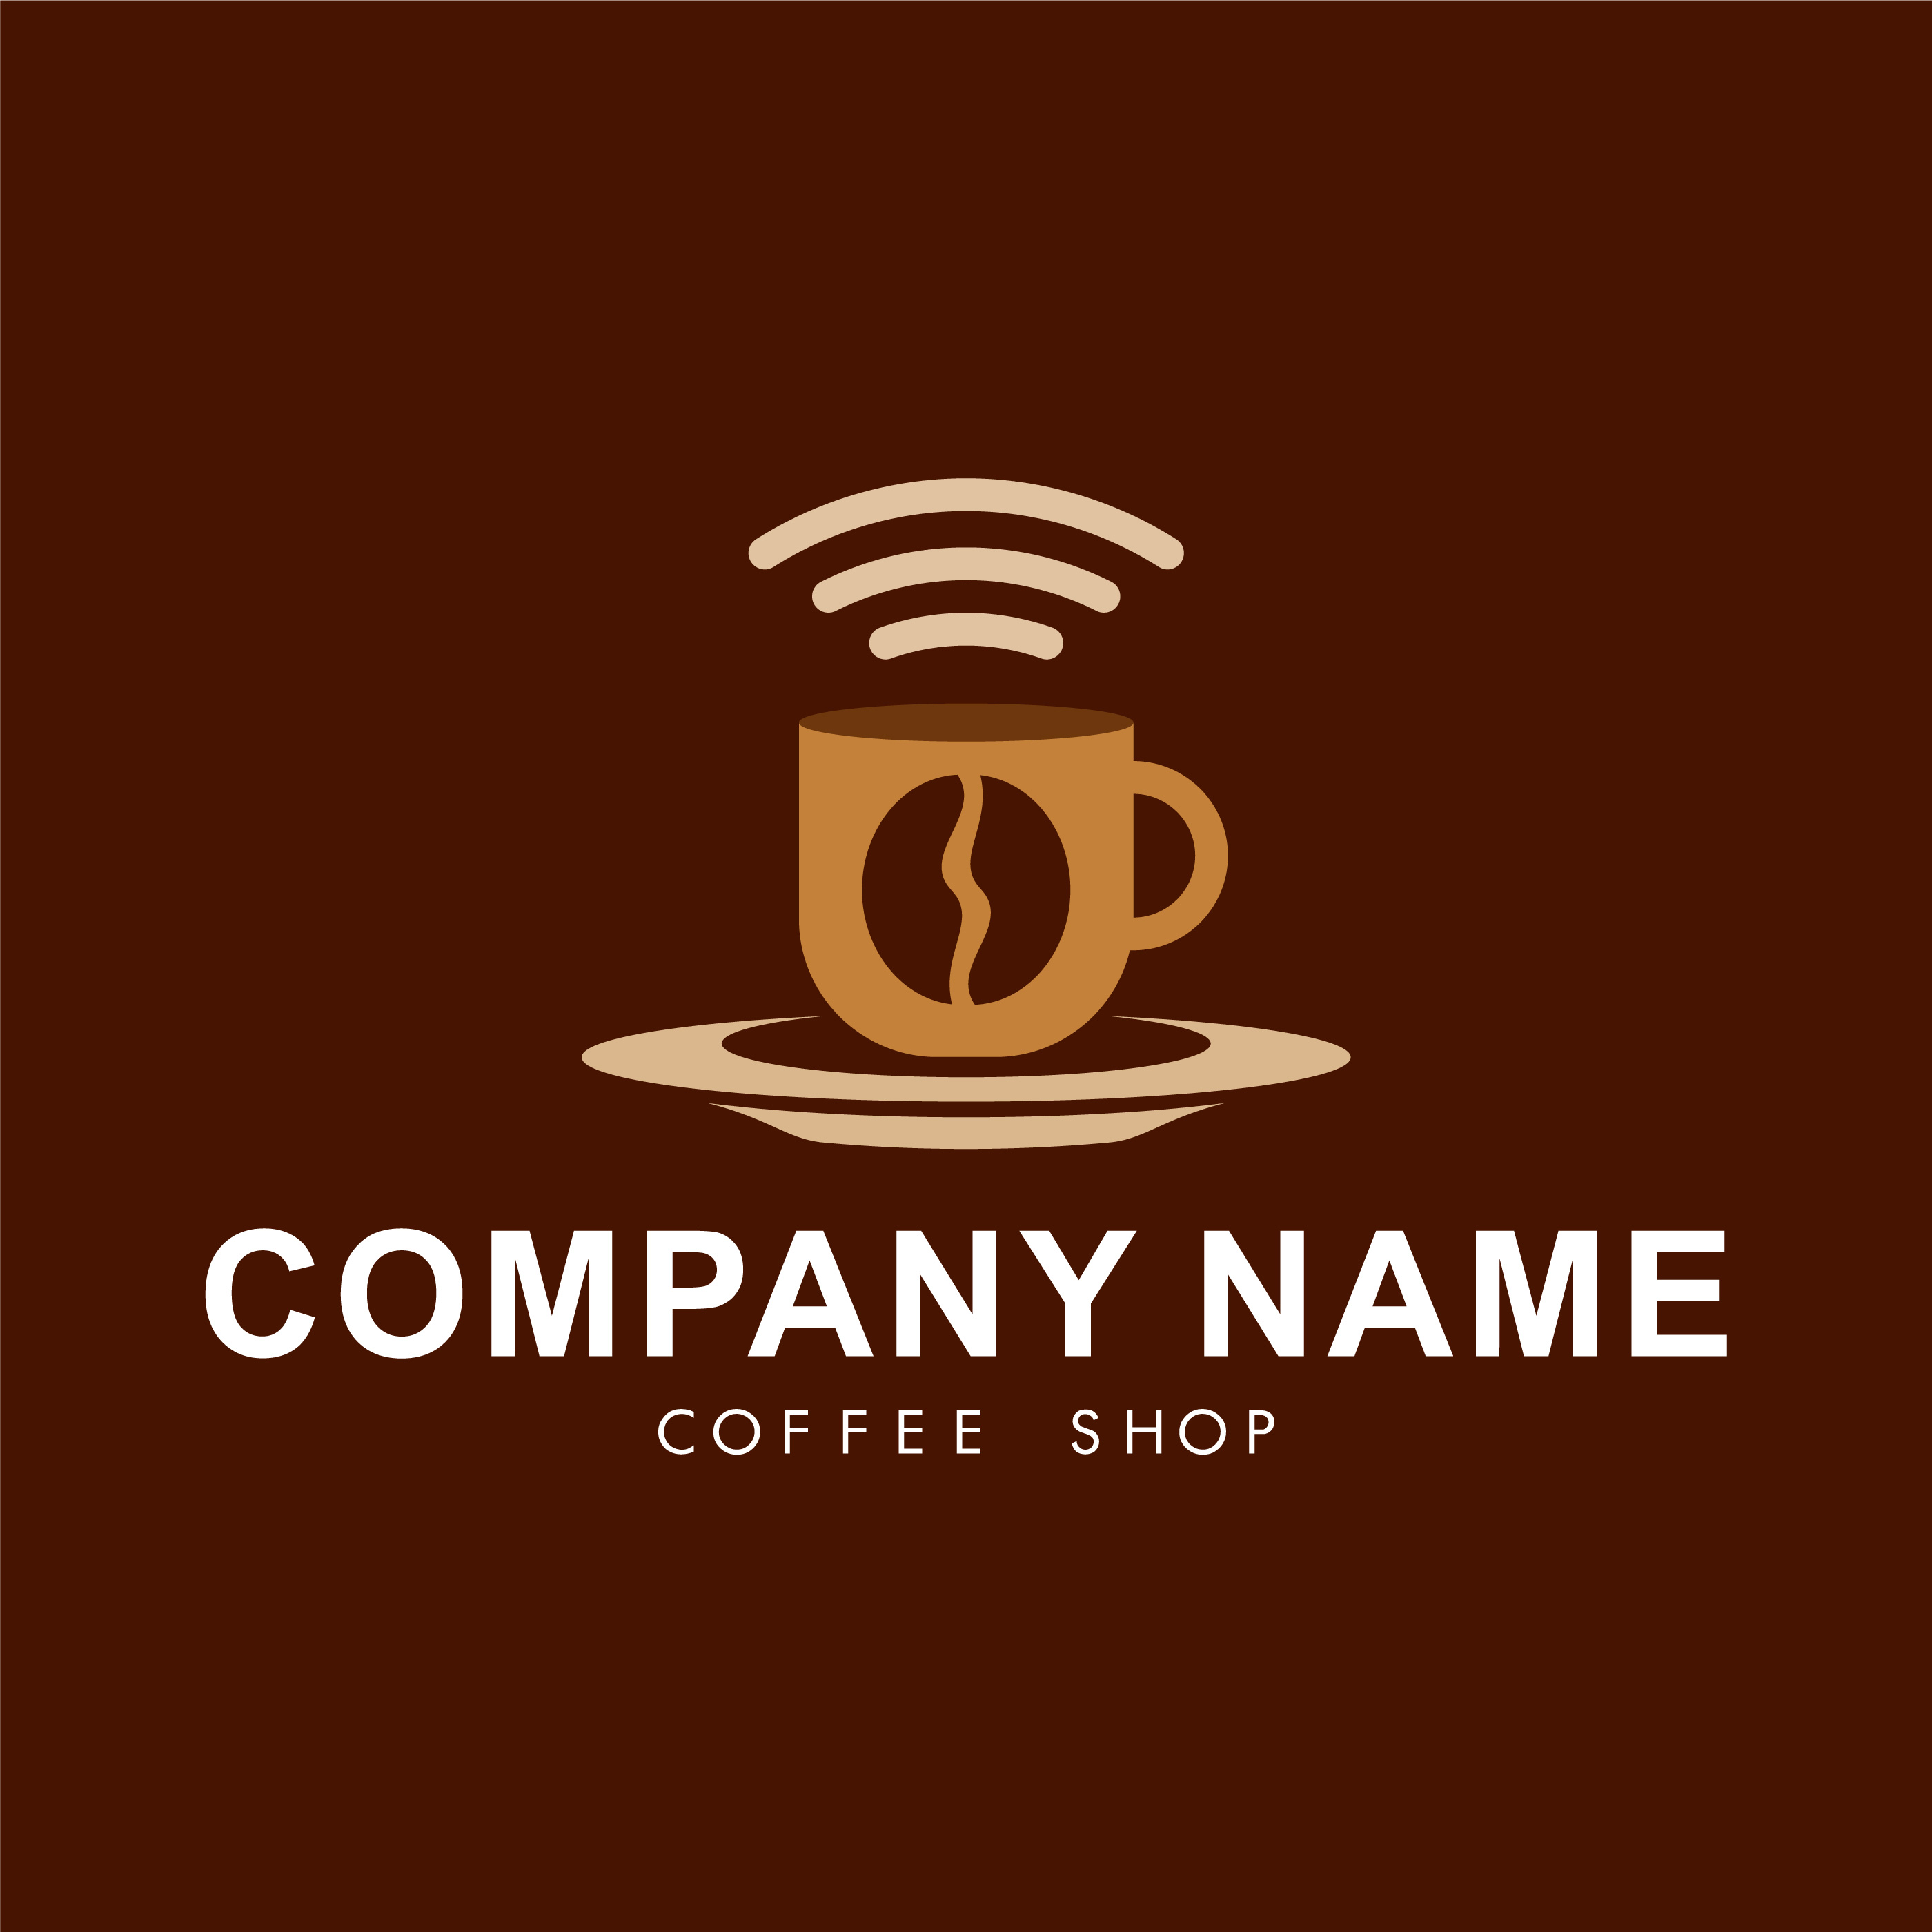 Coffee Shop Logo Template 182421